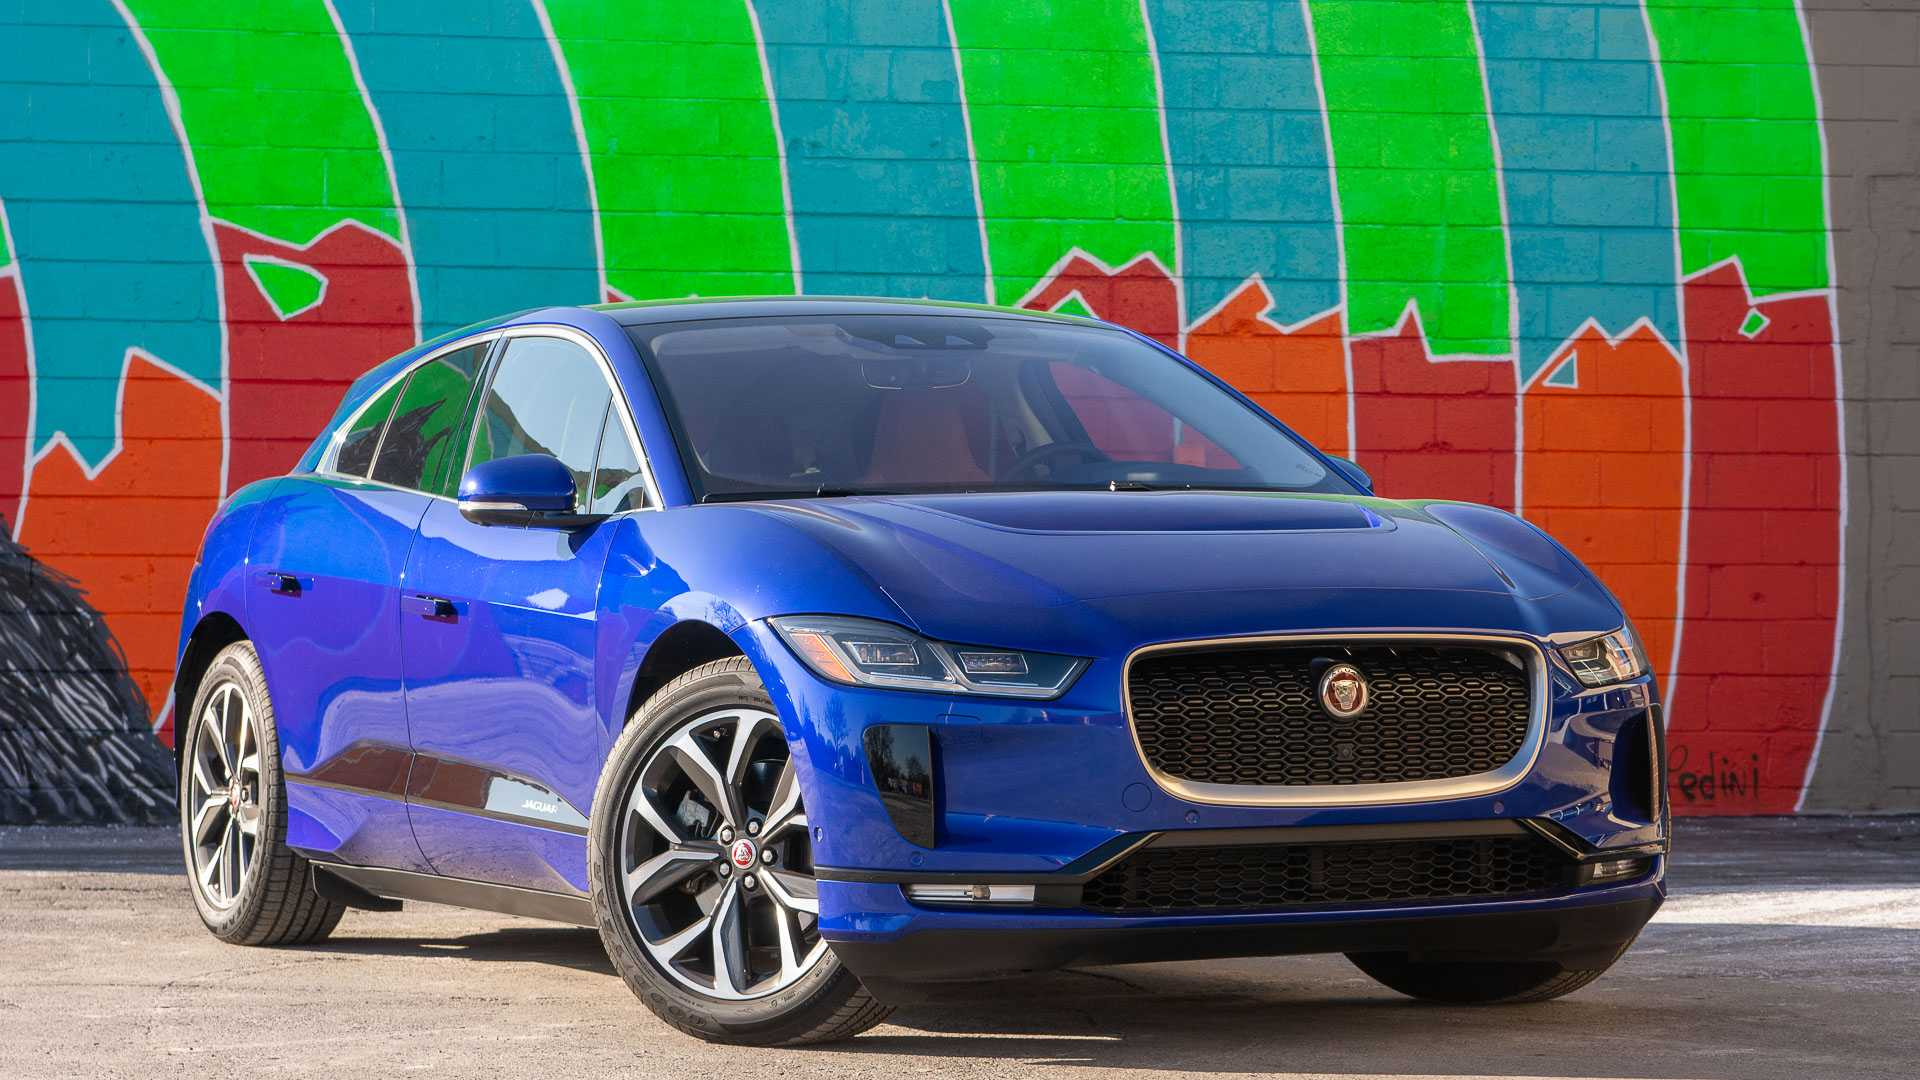 2020 Jaguar I-Pace Price, Review, Range, Specs >> 2019 Jaguar I Pace Ev400 Hse Review Silent Stunner